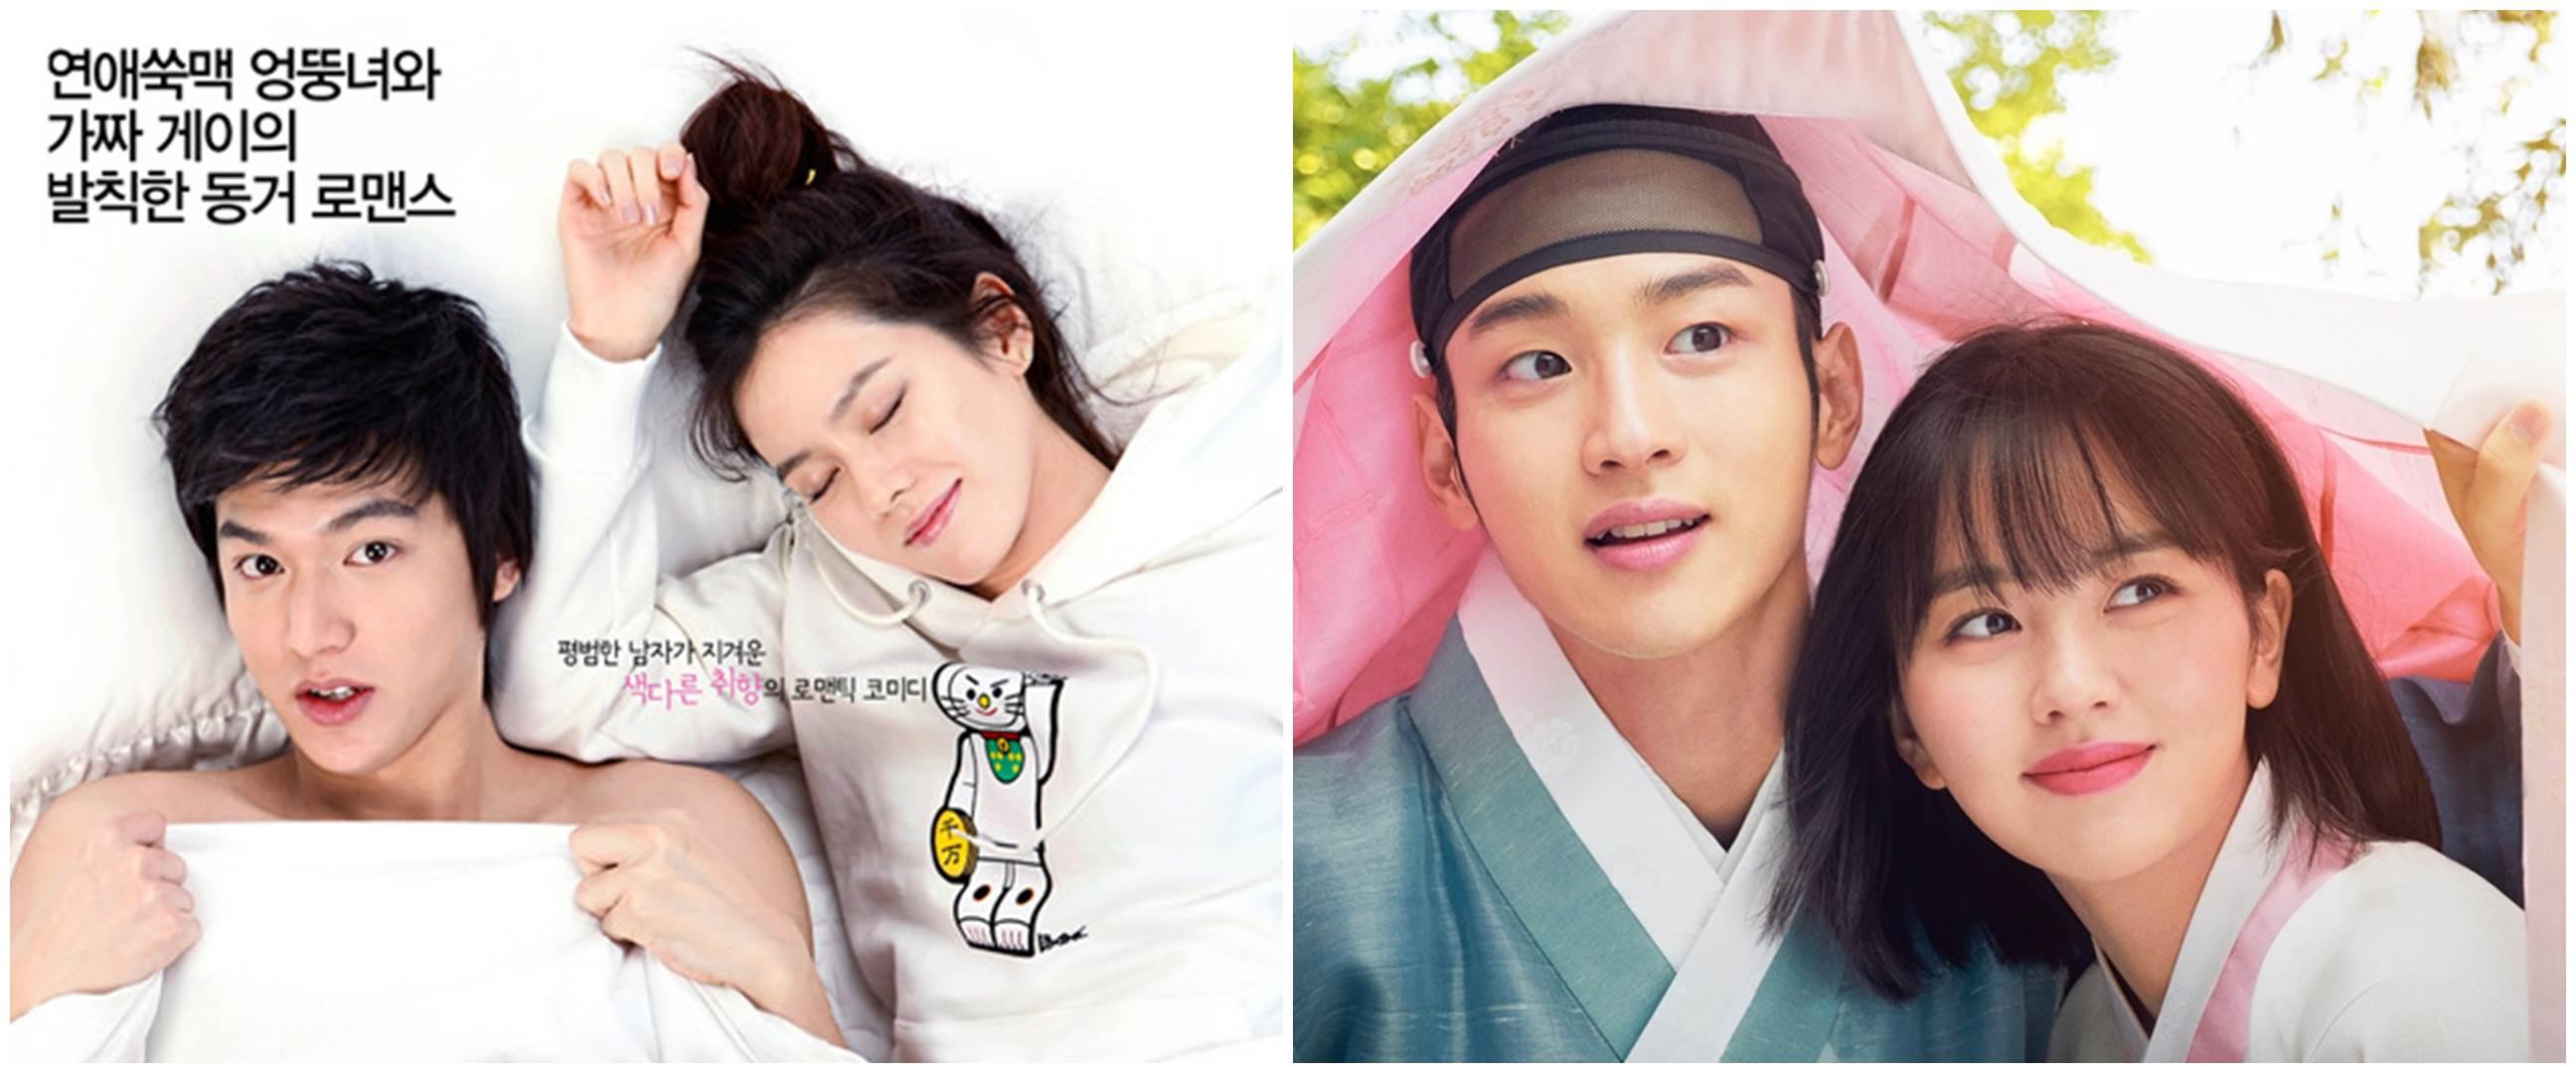 15 Drama Korea romantis cinlok satu atap, menarik tonton ulang